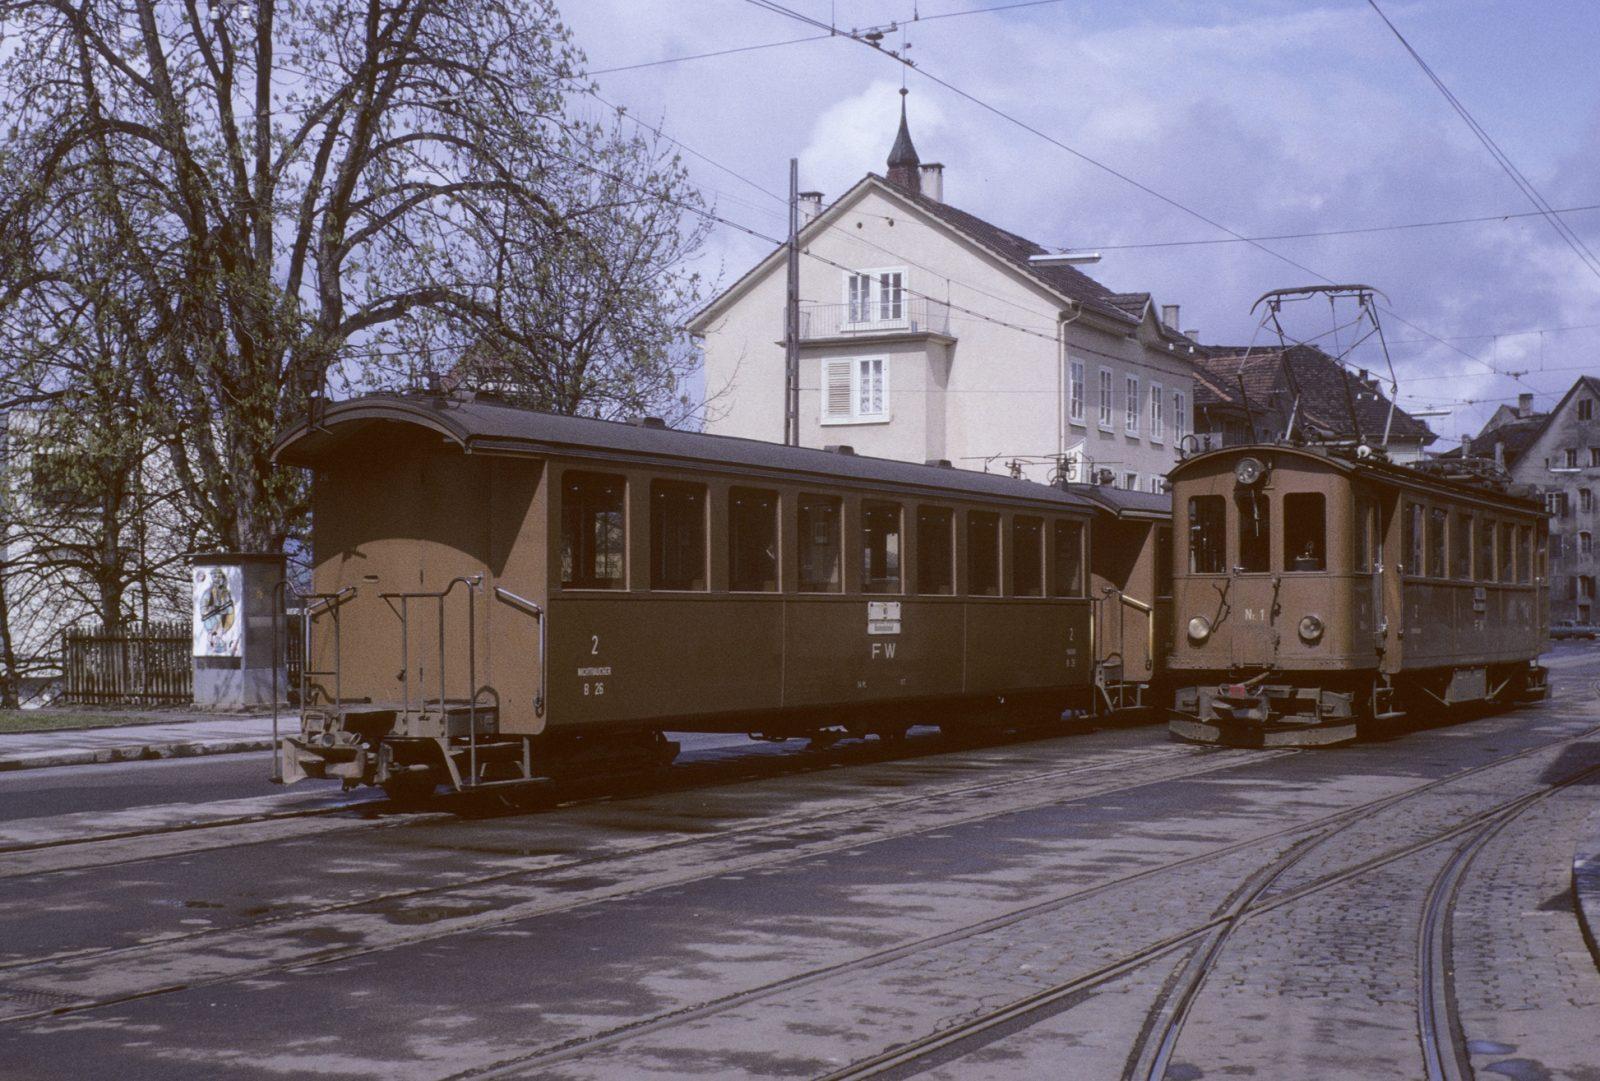 Bahnhofsaltag in Frauenfeld Stadt